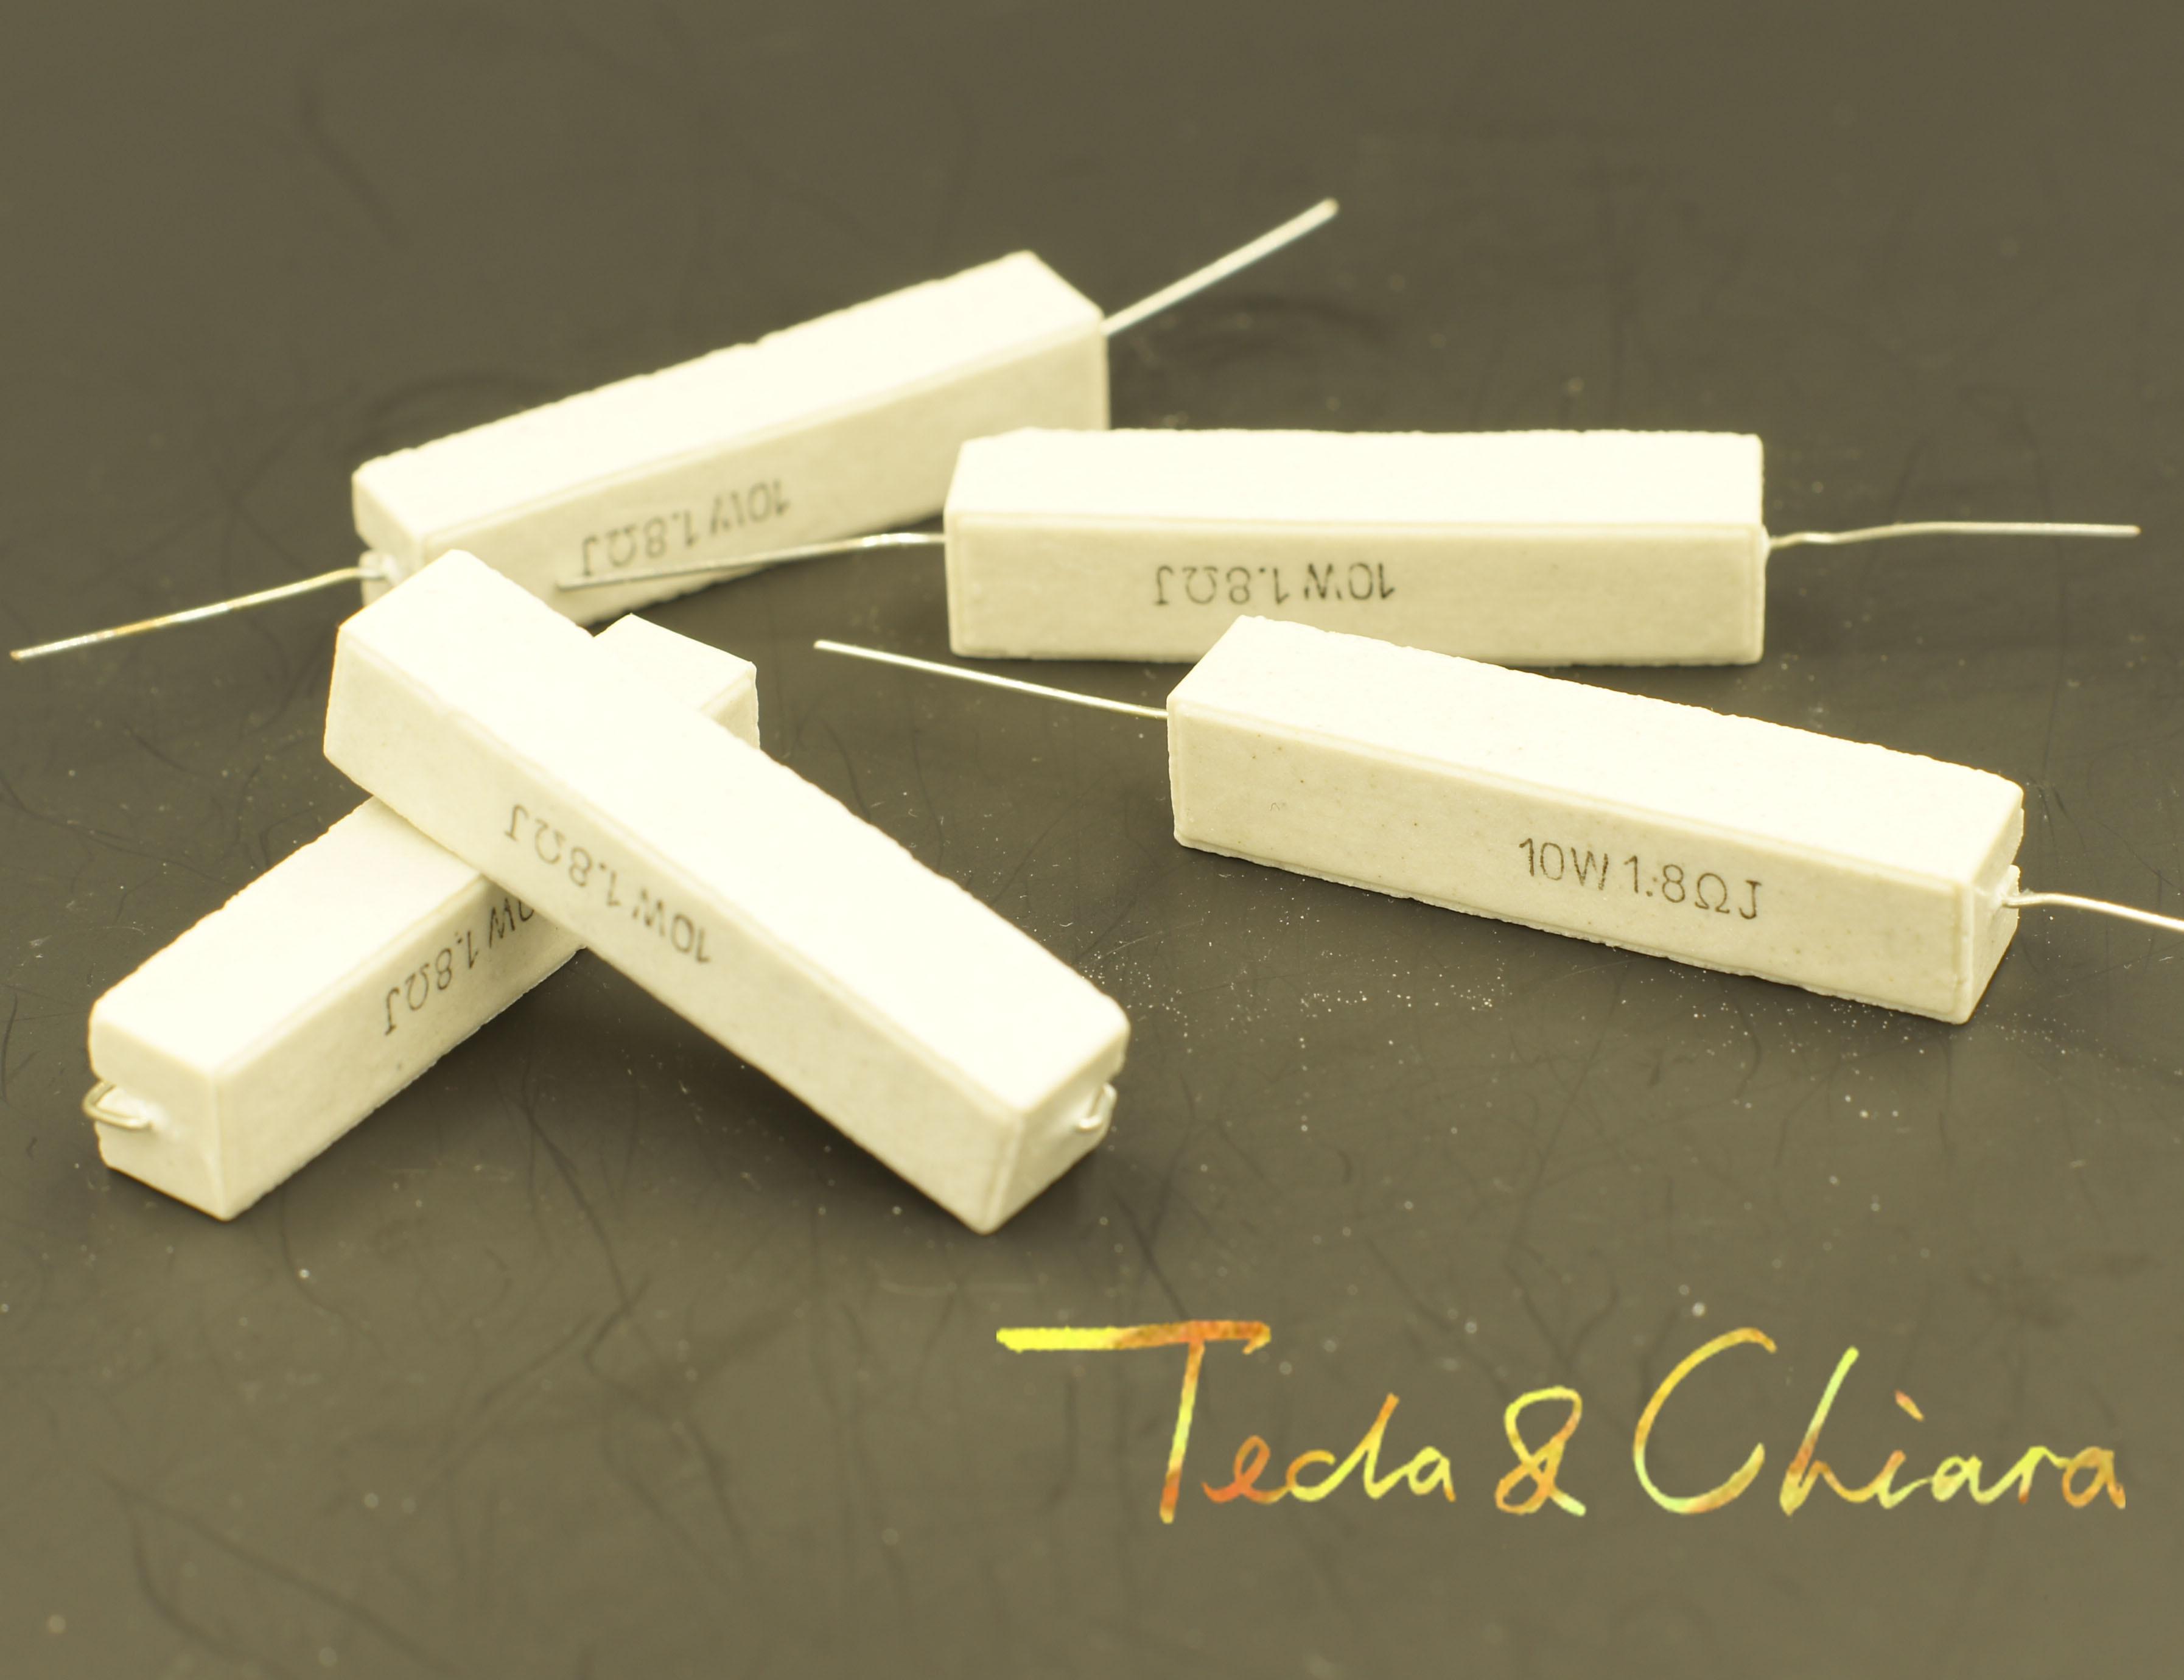 10Pcs 10W 0.1R 0.22R 0.25R 0.1ohm 0.22ohm 0.25ohm 0.1 0.22 0.25 5% Cement Ceramic Power Horizontal Resistor Resistance R Ohm 10 pcs 47 ohm 10w ceramic cement resistor 47r 10 watt